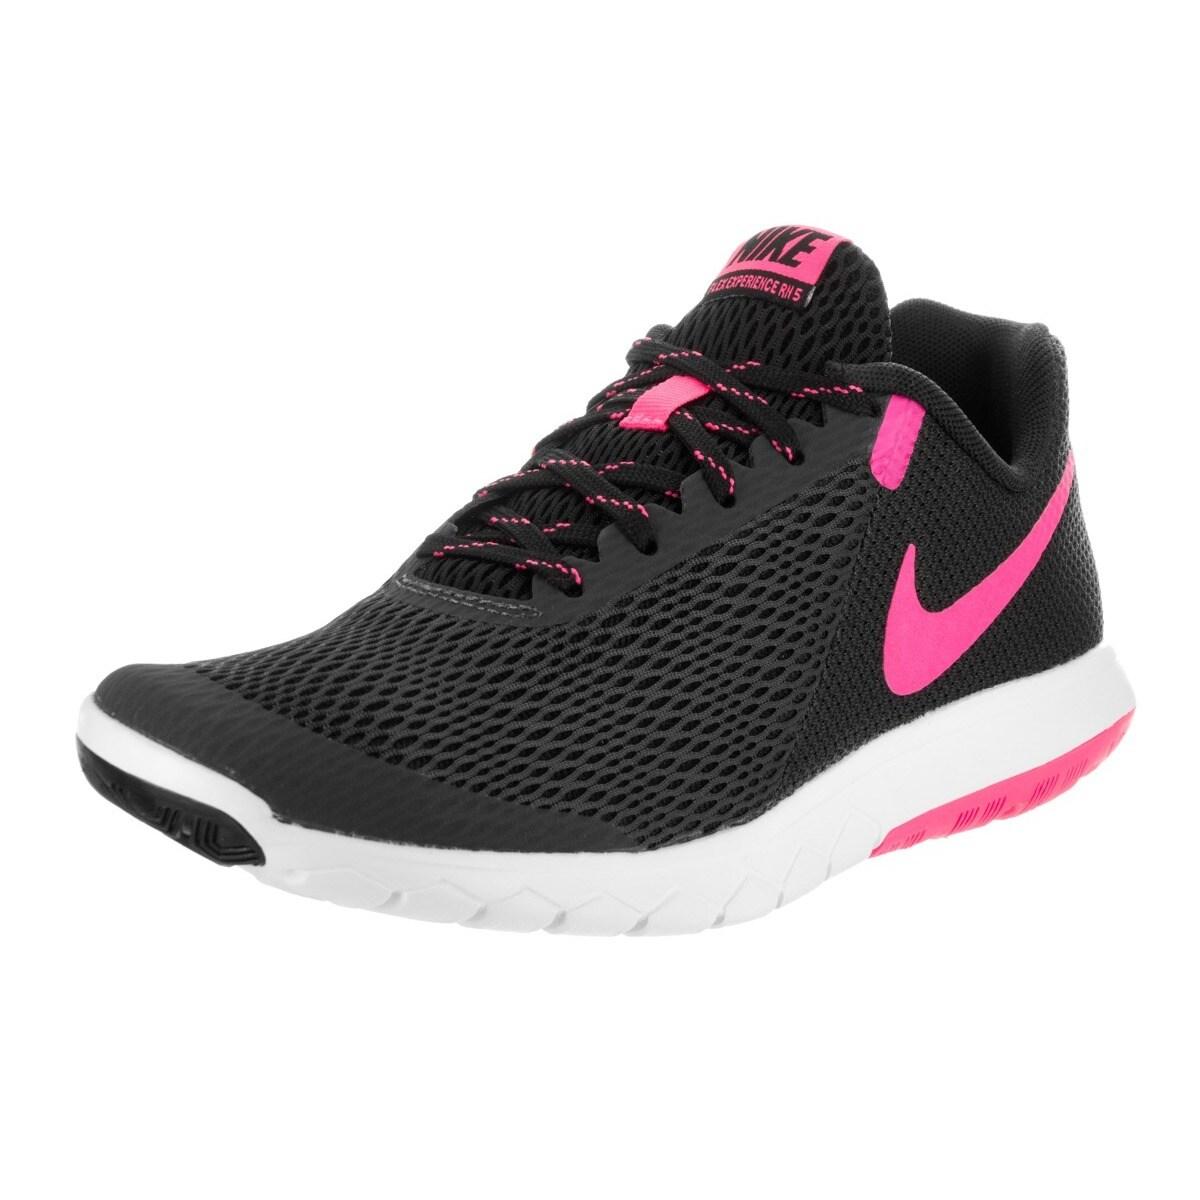 Nike Women's Flex Experience Run 5 Black Mesh Running Sho...